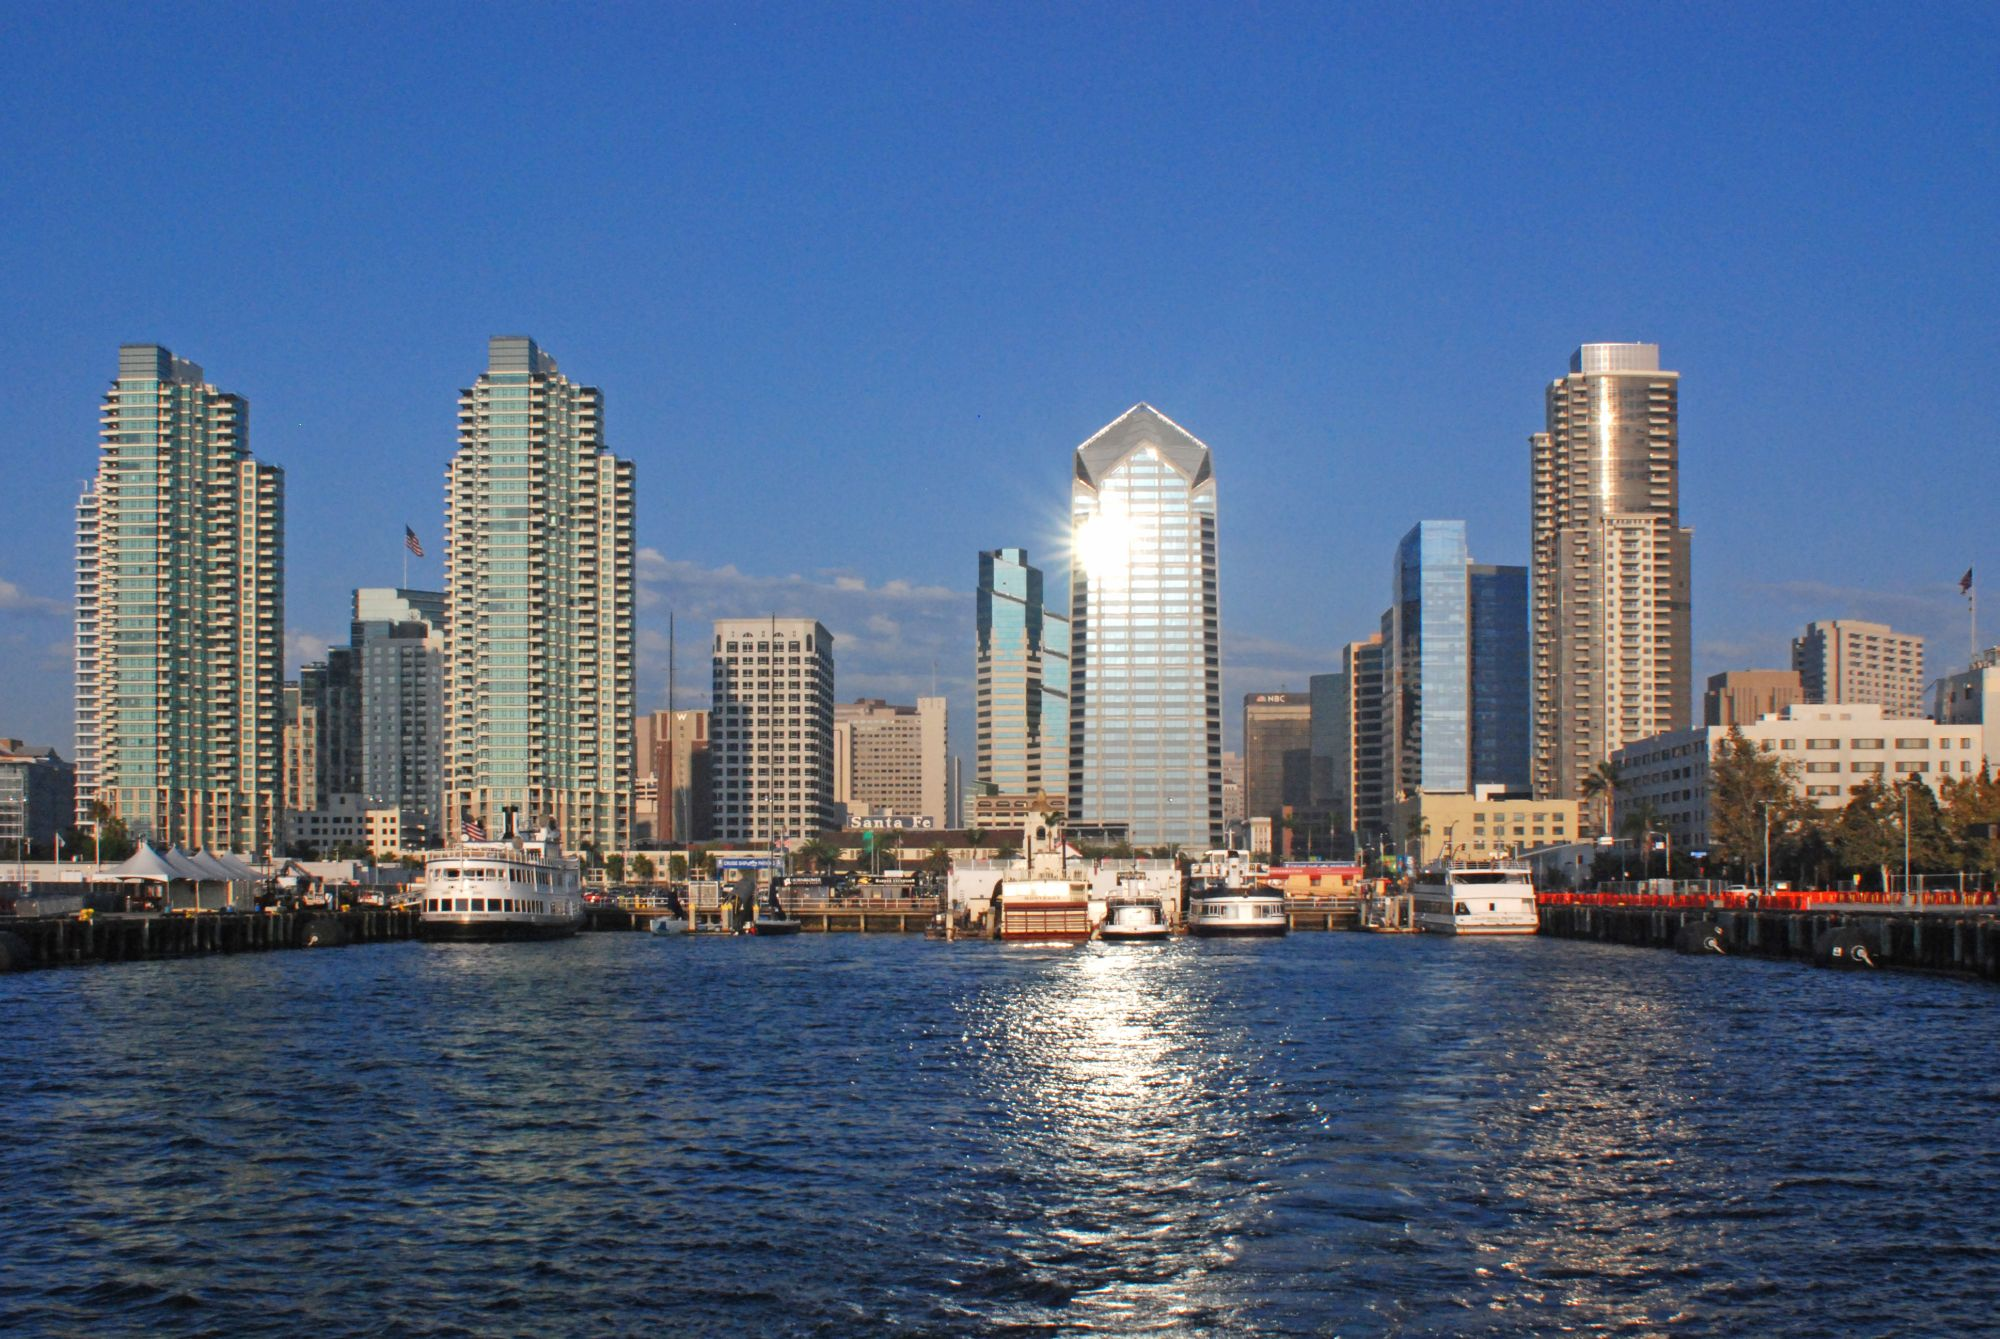 File:San Diego bay 2.jpg - Wikimedia Commons